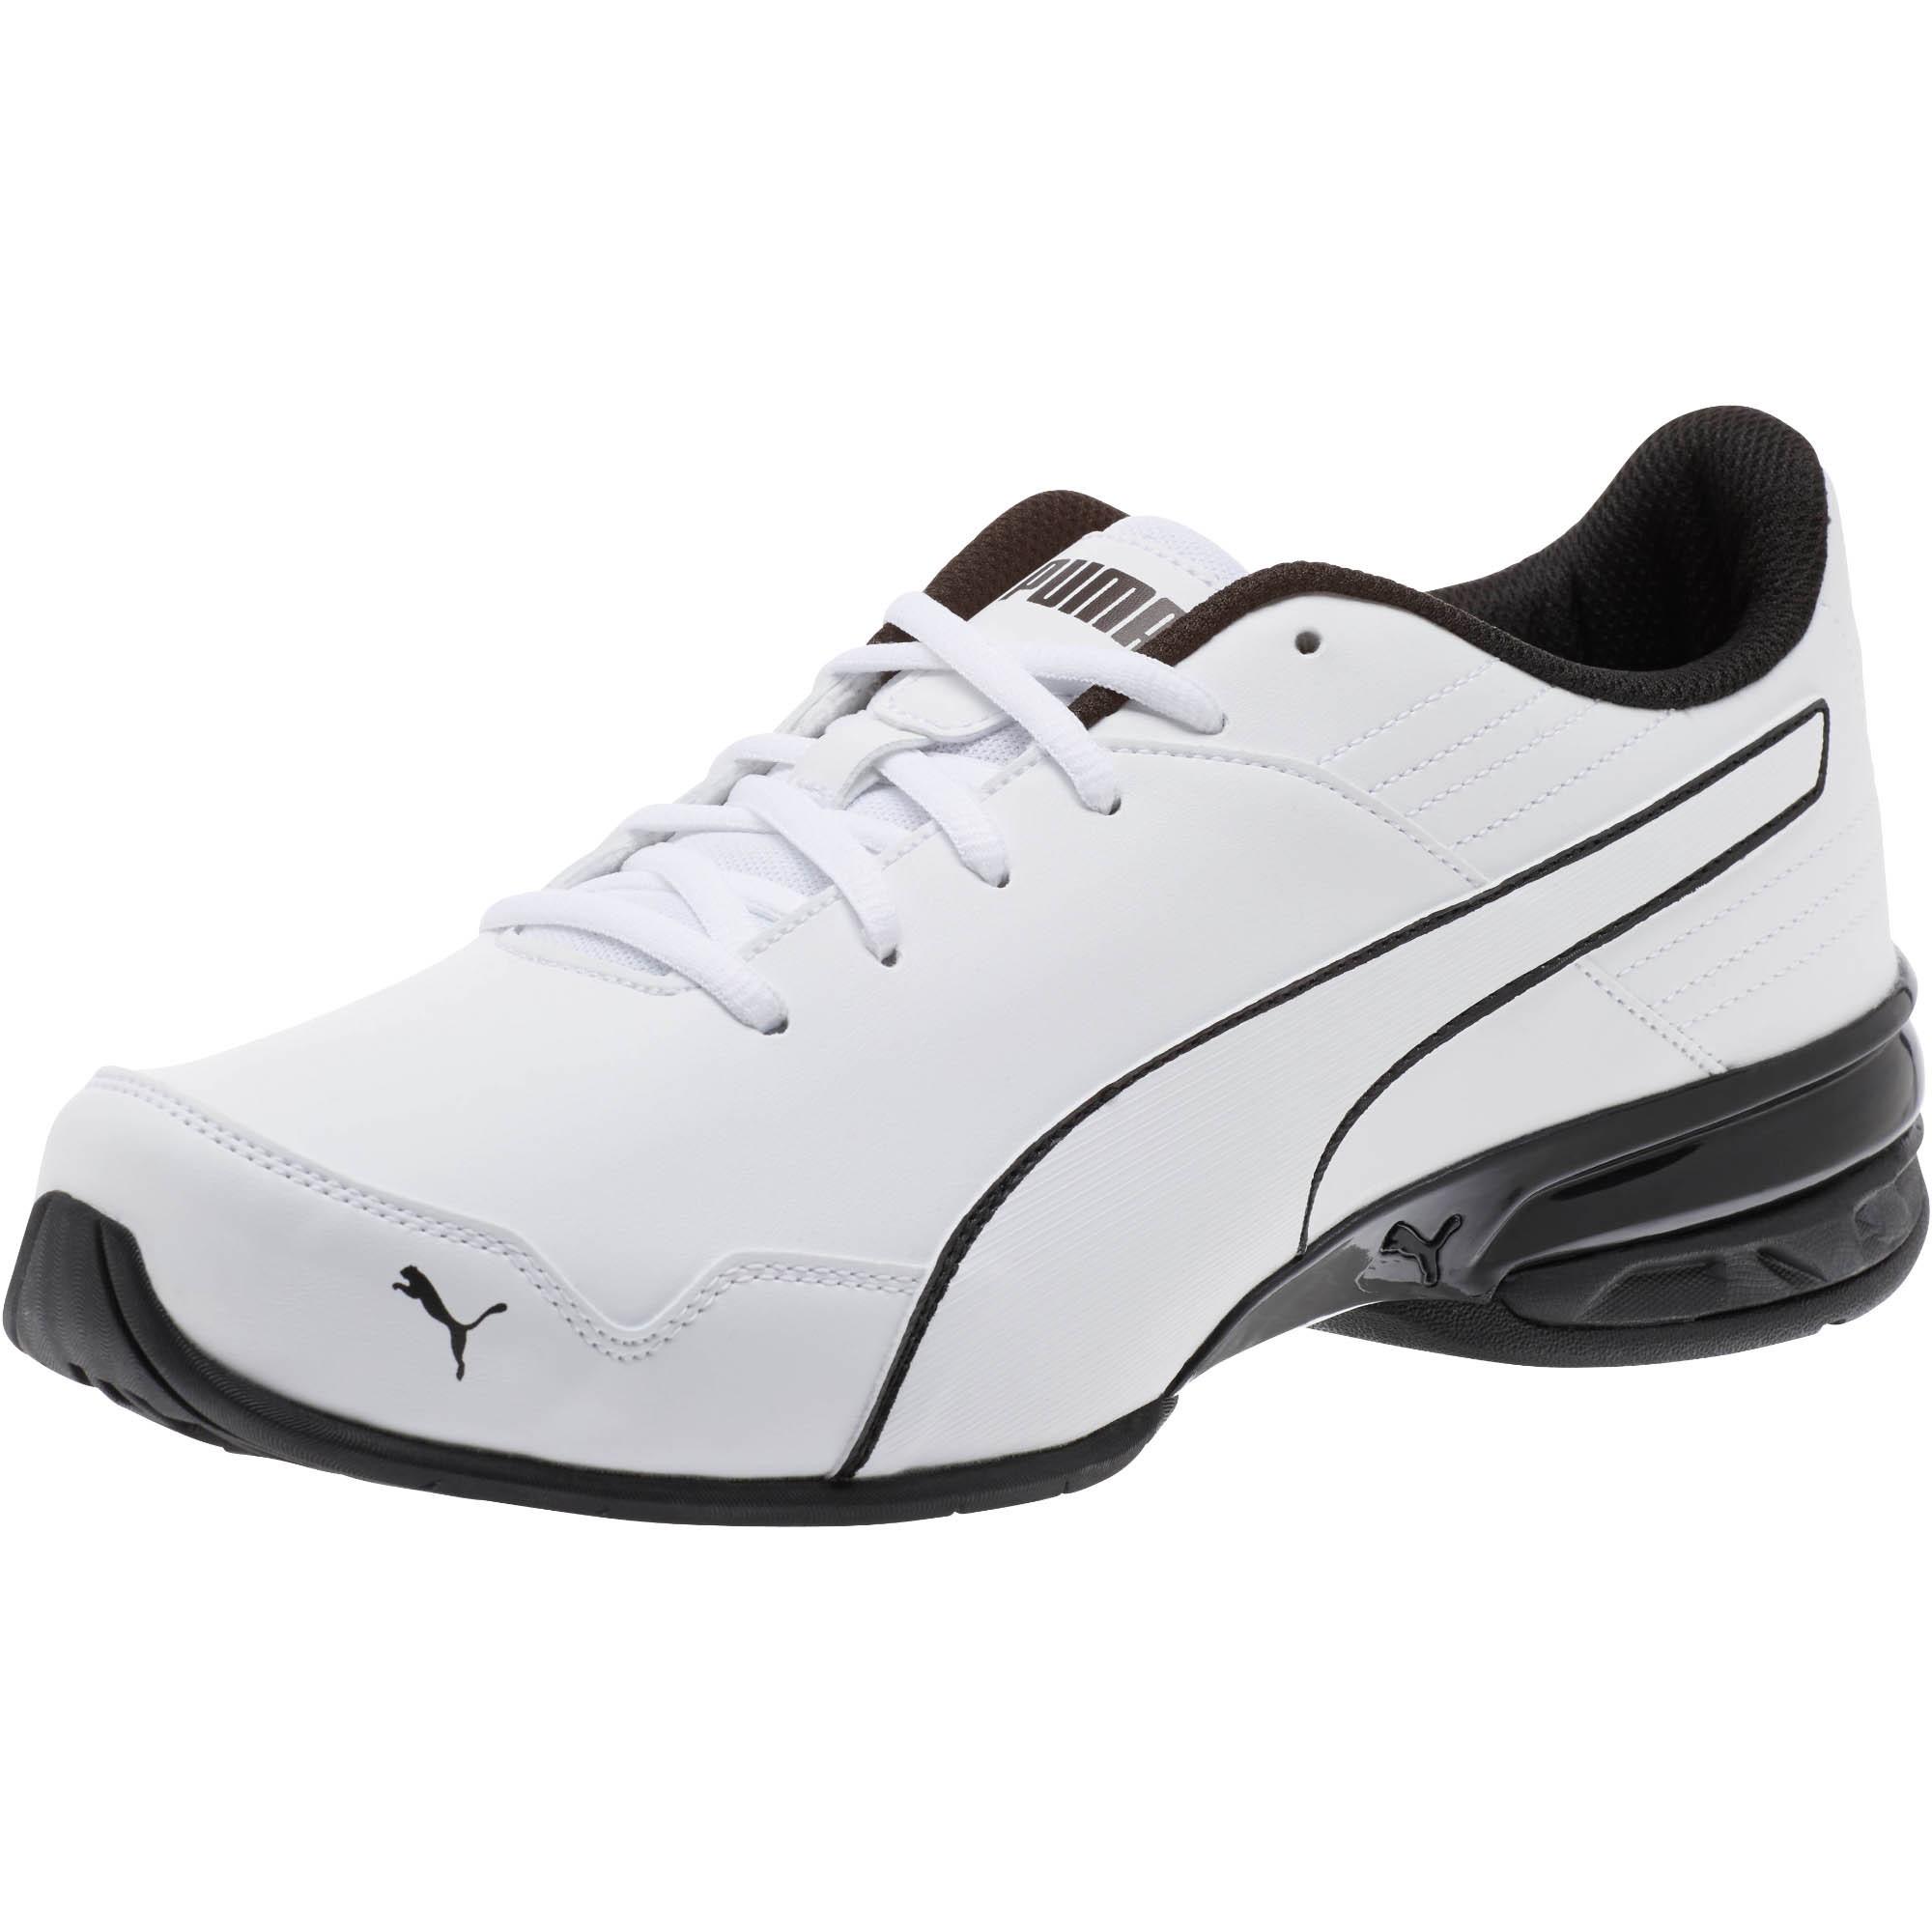 8fbdfd816da Men s Super Levitate White Ankle-High Leather Golf Shoe - 10.5M -  Walmart.com